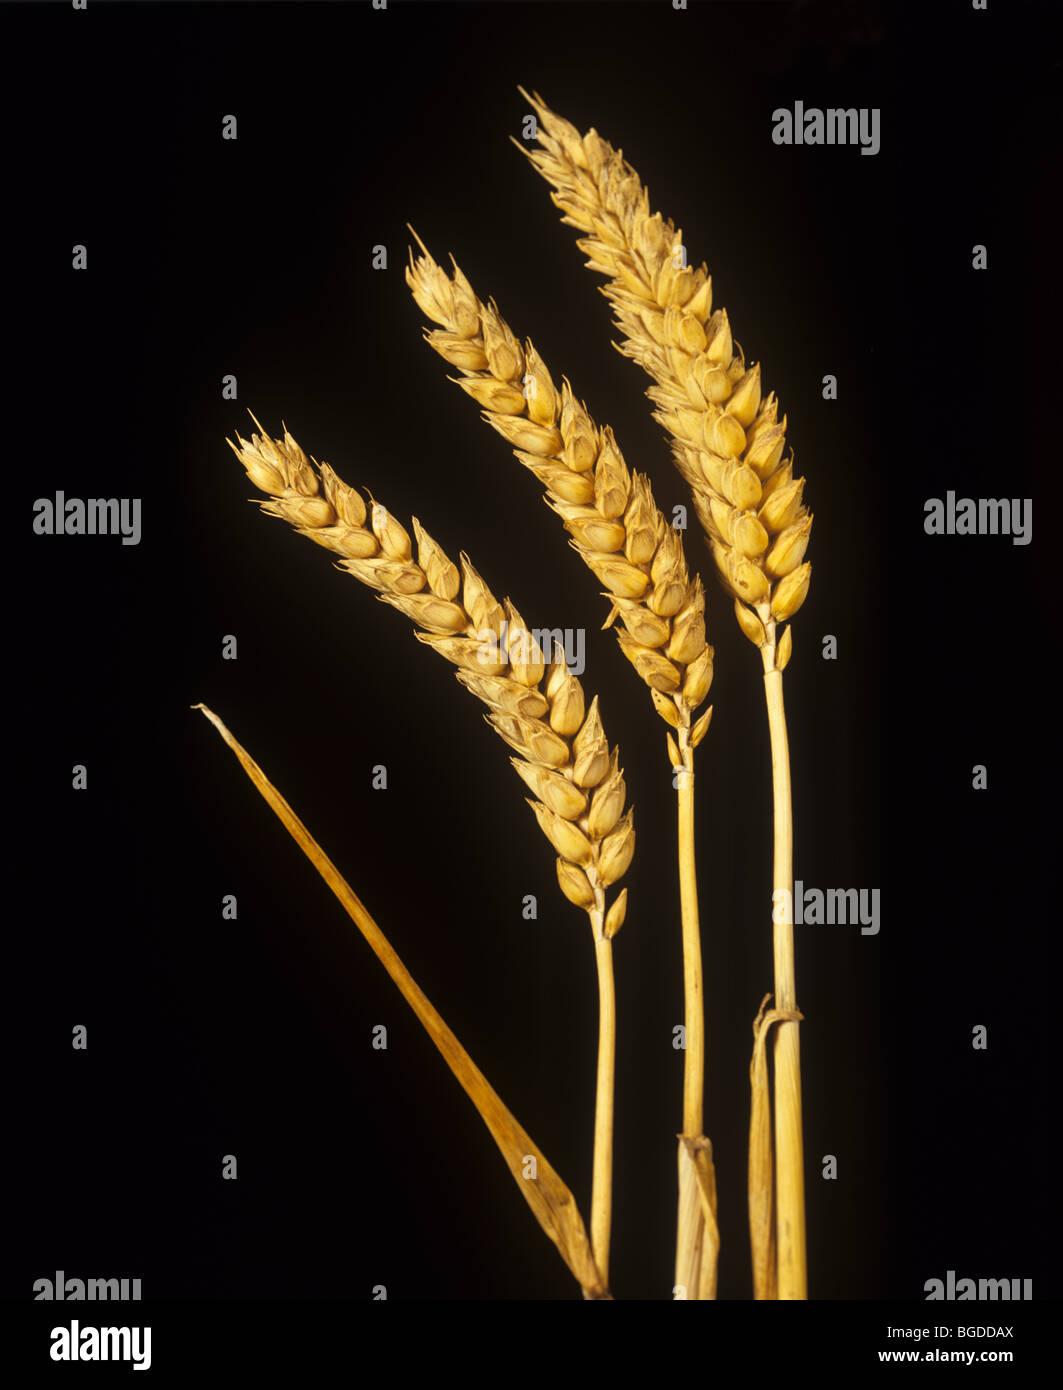 Espigas maduras de trigo de invierno de oro contra un fondo negro Imagen De Stock